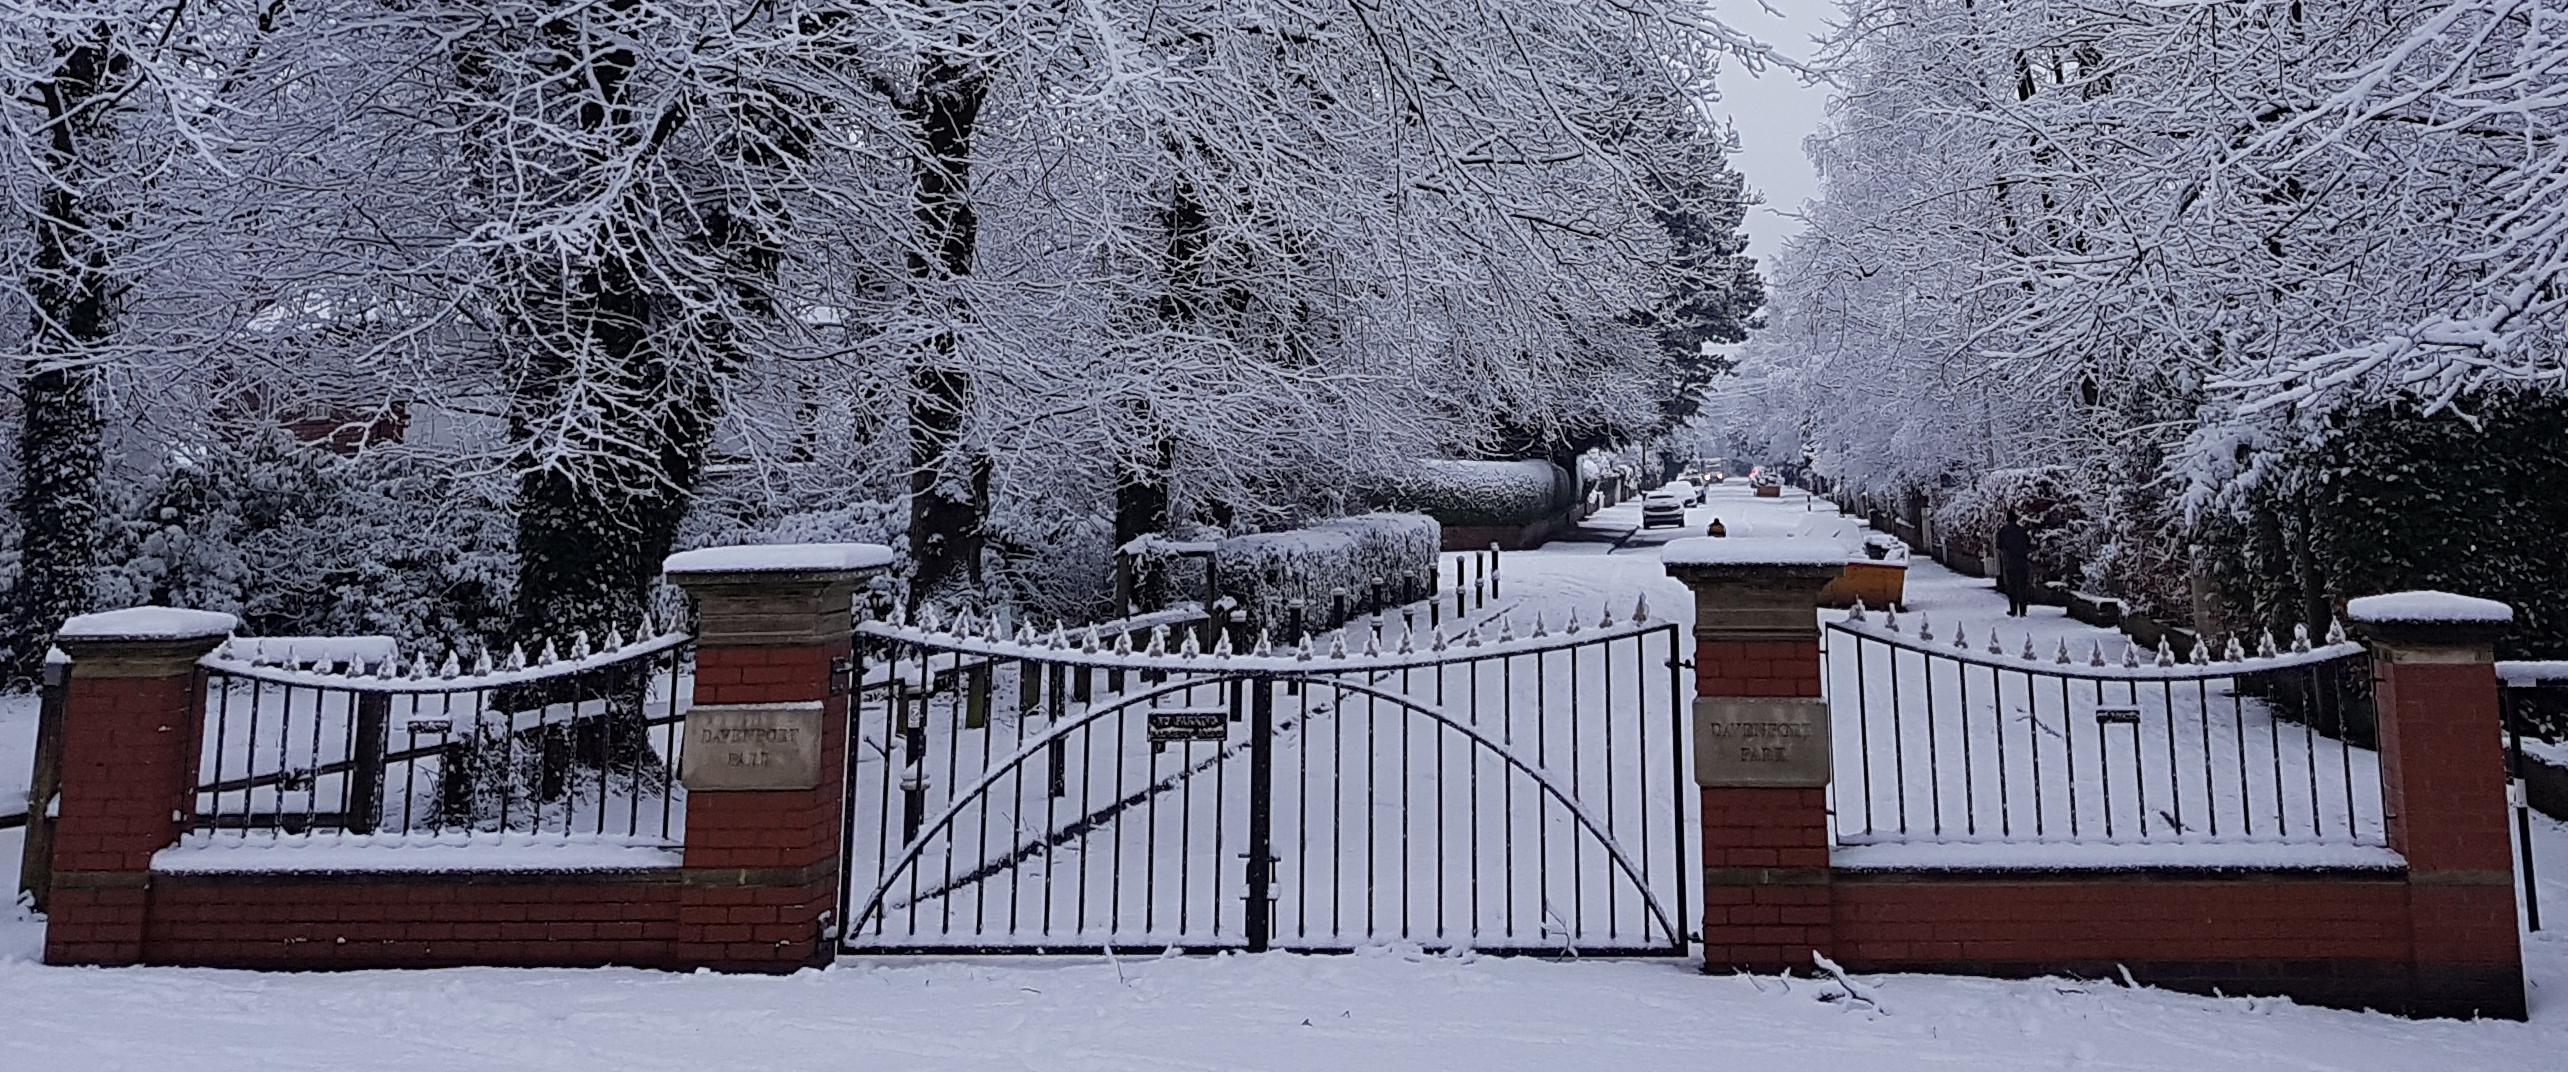 DPP-Gates-snow